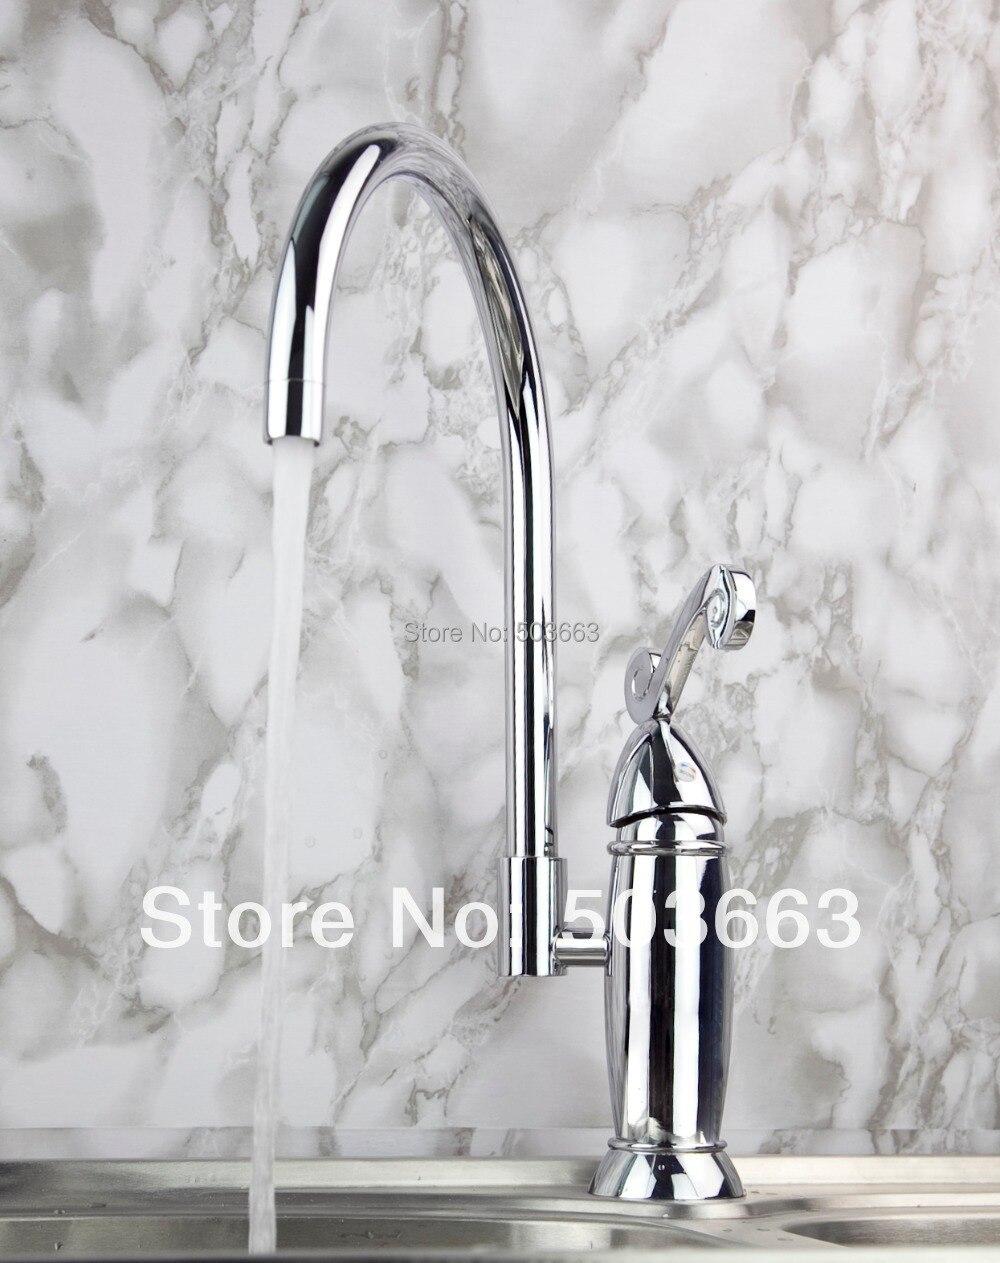 Pretty Swivel Chrome Brass Bibcock Kitchen Faucet Spout Vessel Basin Sink Single Handle Deck Mounted Mixer